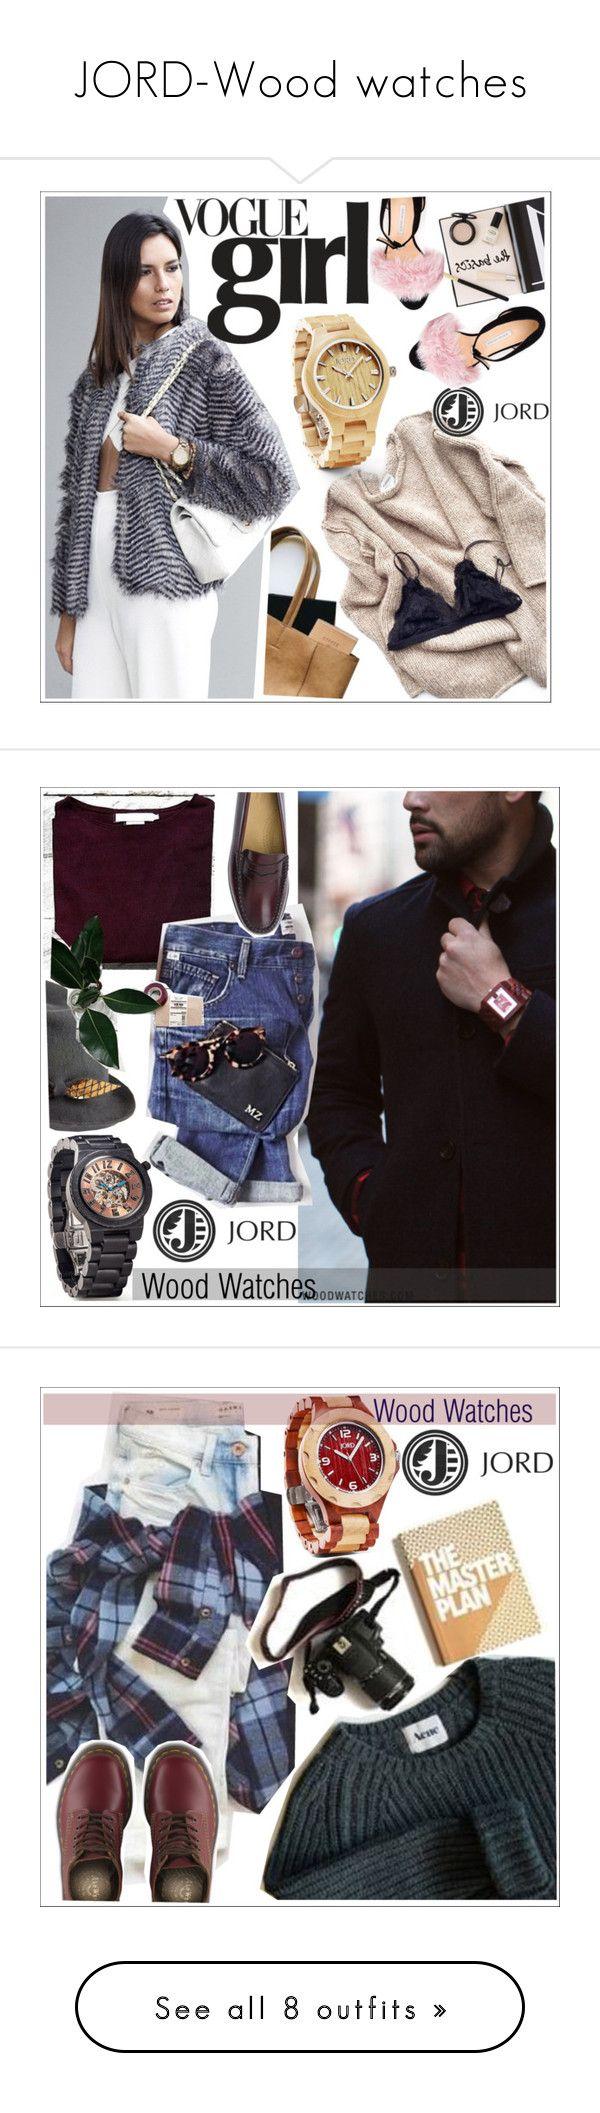 """JORD-Wood watches"" by teoecar ❤ liked on Polyvore featuring jord, moda, Nuevo, Fieldcrest, Prada, Bionda Castana, Justine Hats, G.H. Bass & Co., Dr. Martens e Nuuna"